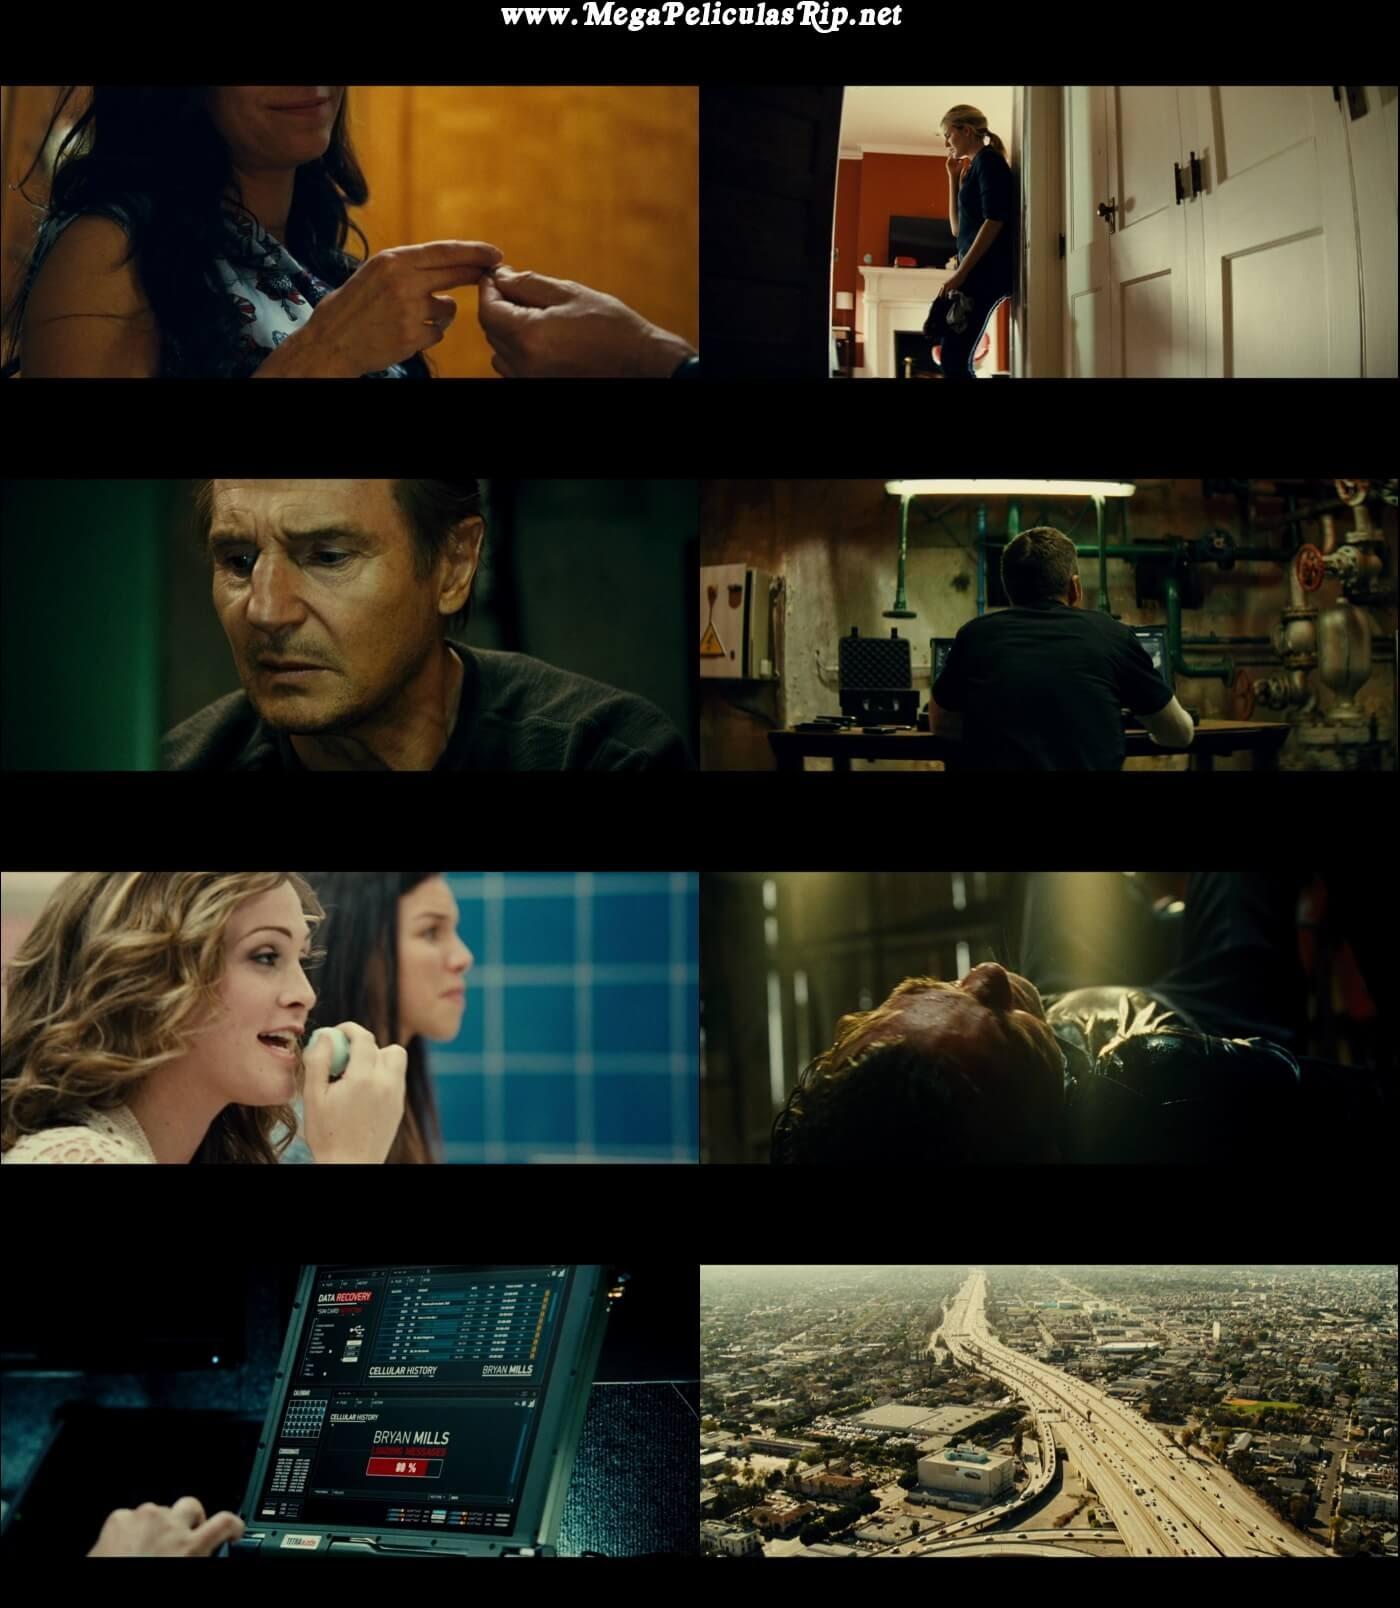 Busqueda Implacable 3 1080p Latino